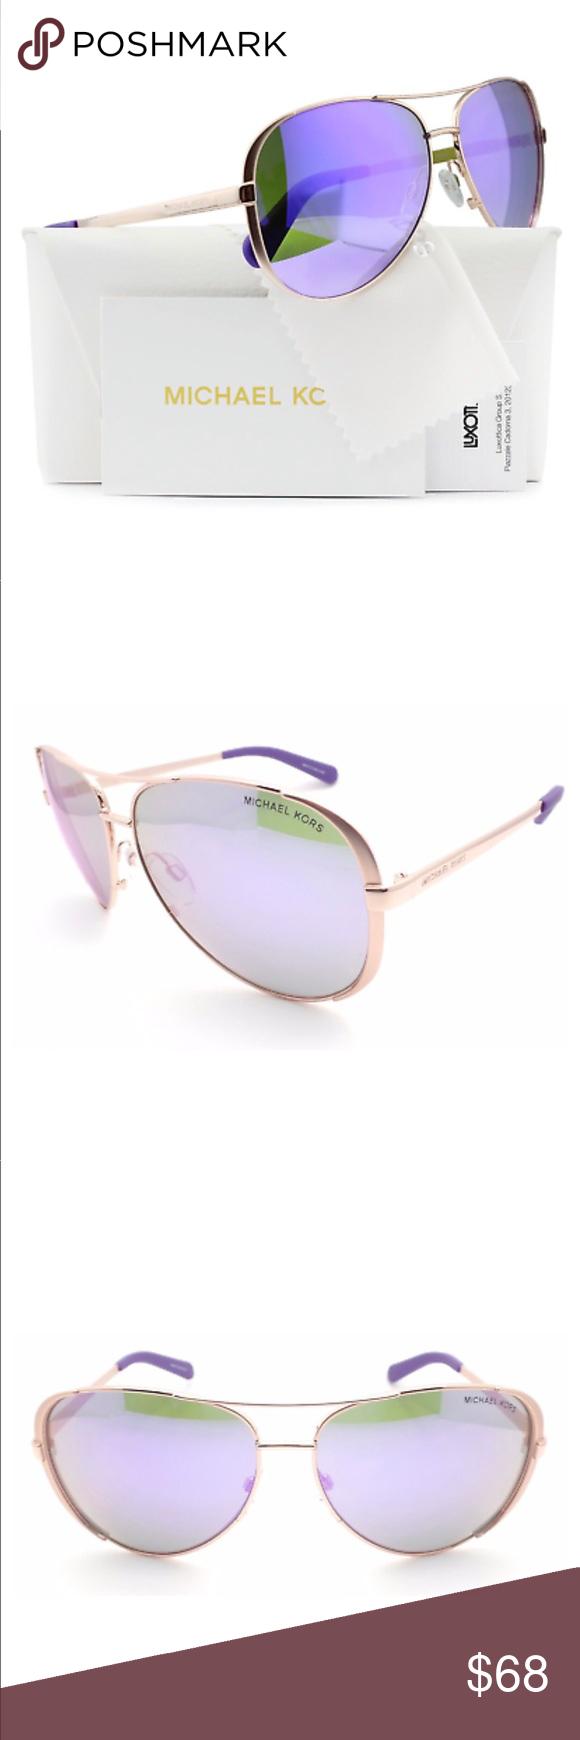 671c55eb43d6 Michael Kors sunglasses Michael Kors MK5004 Chelsea Aviator Sunglasses Rose  Gold w/Purple Mirror (